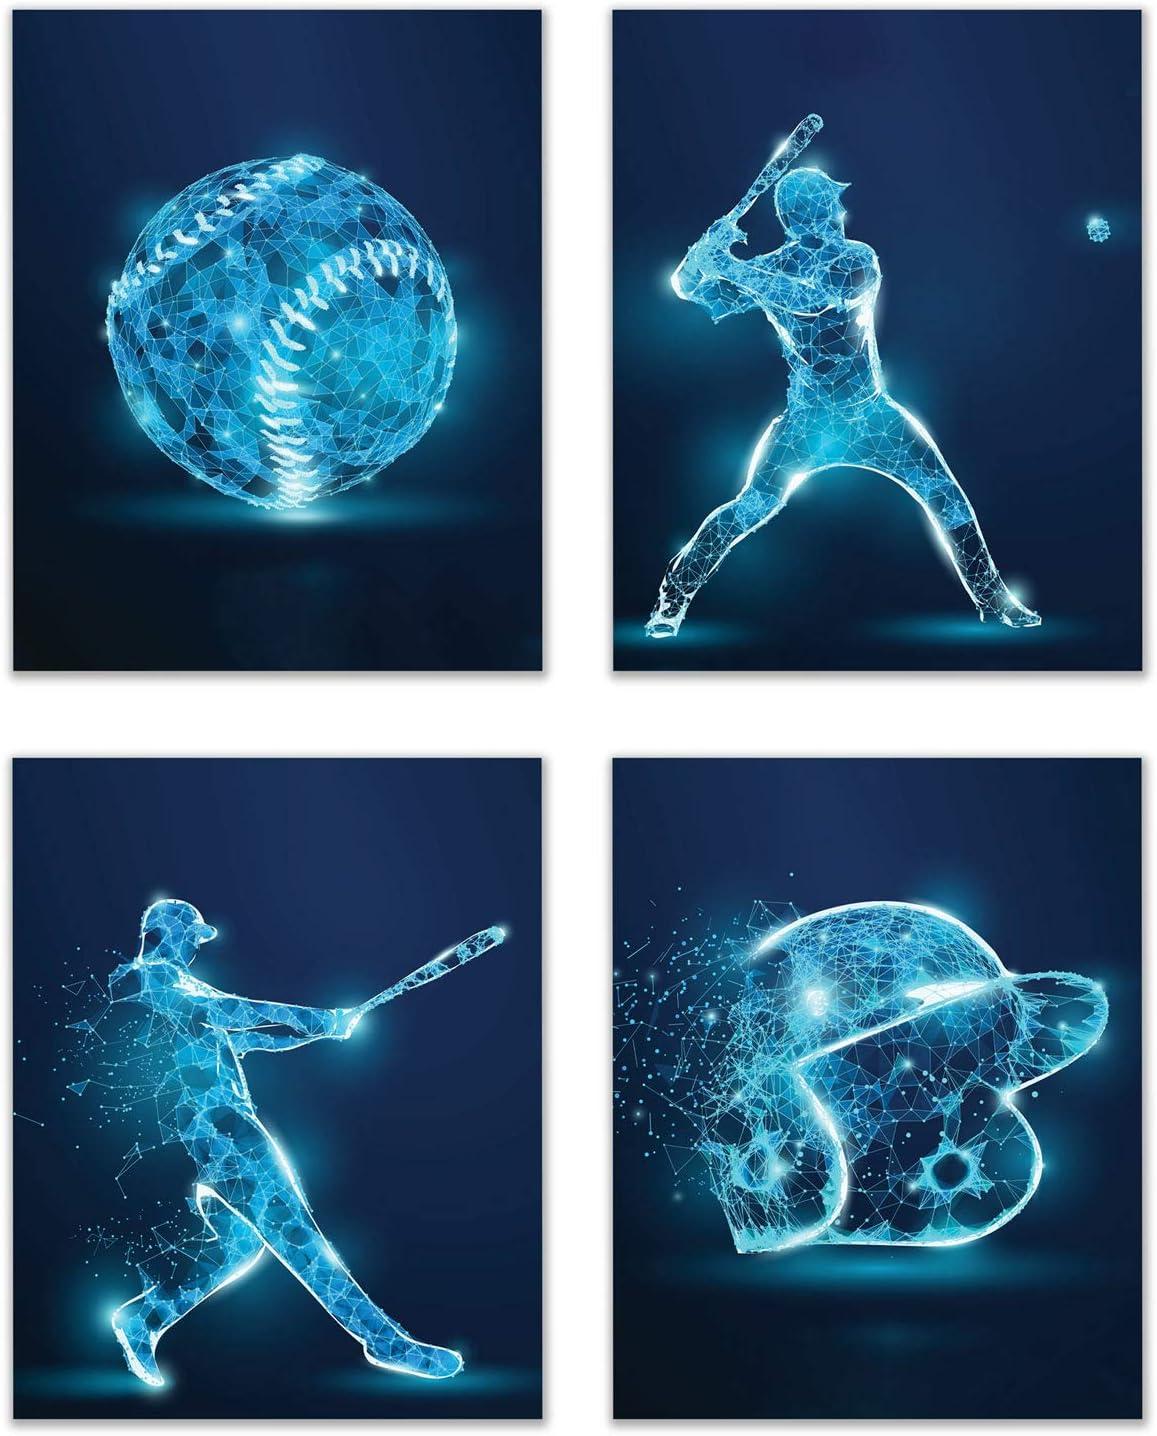 Baseball X-Ray Wall Art Decor Prints - Set of 4 (8x10) Inch Unframed Poster Photos - Bedroom